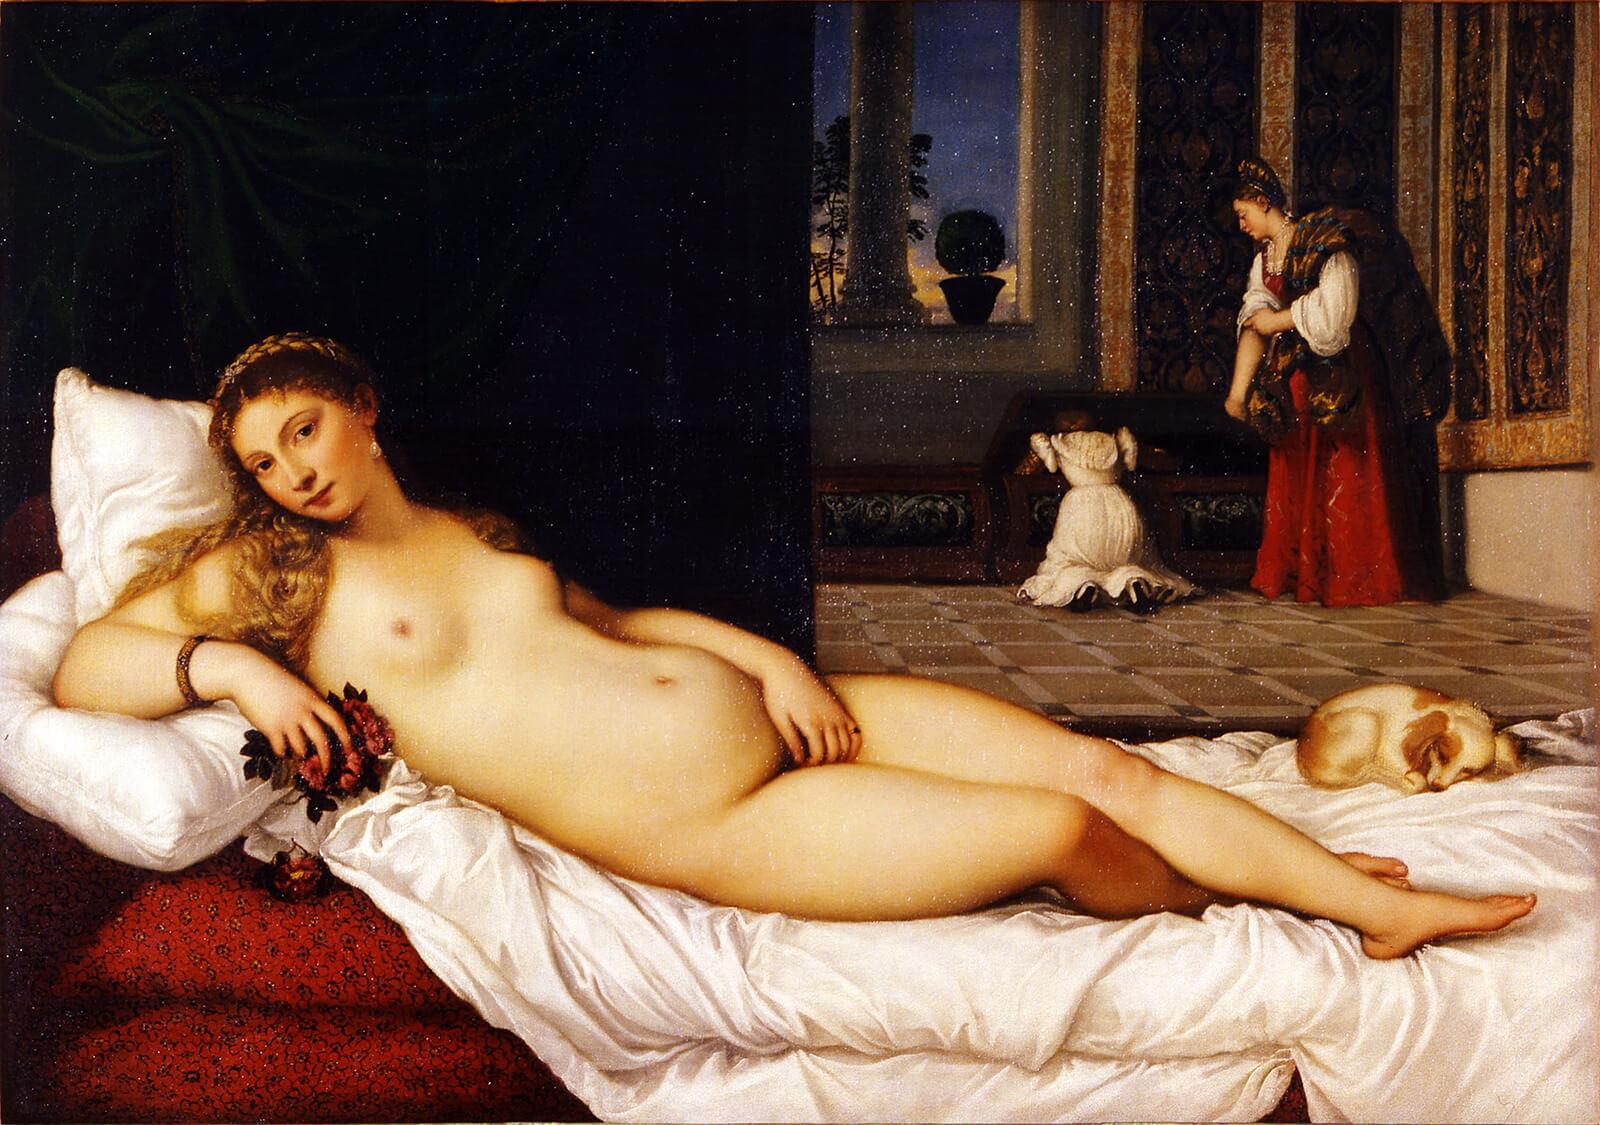 Seems good naked pagan goddesses nude art that interrupt